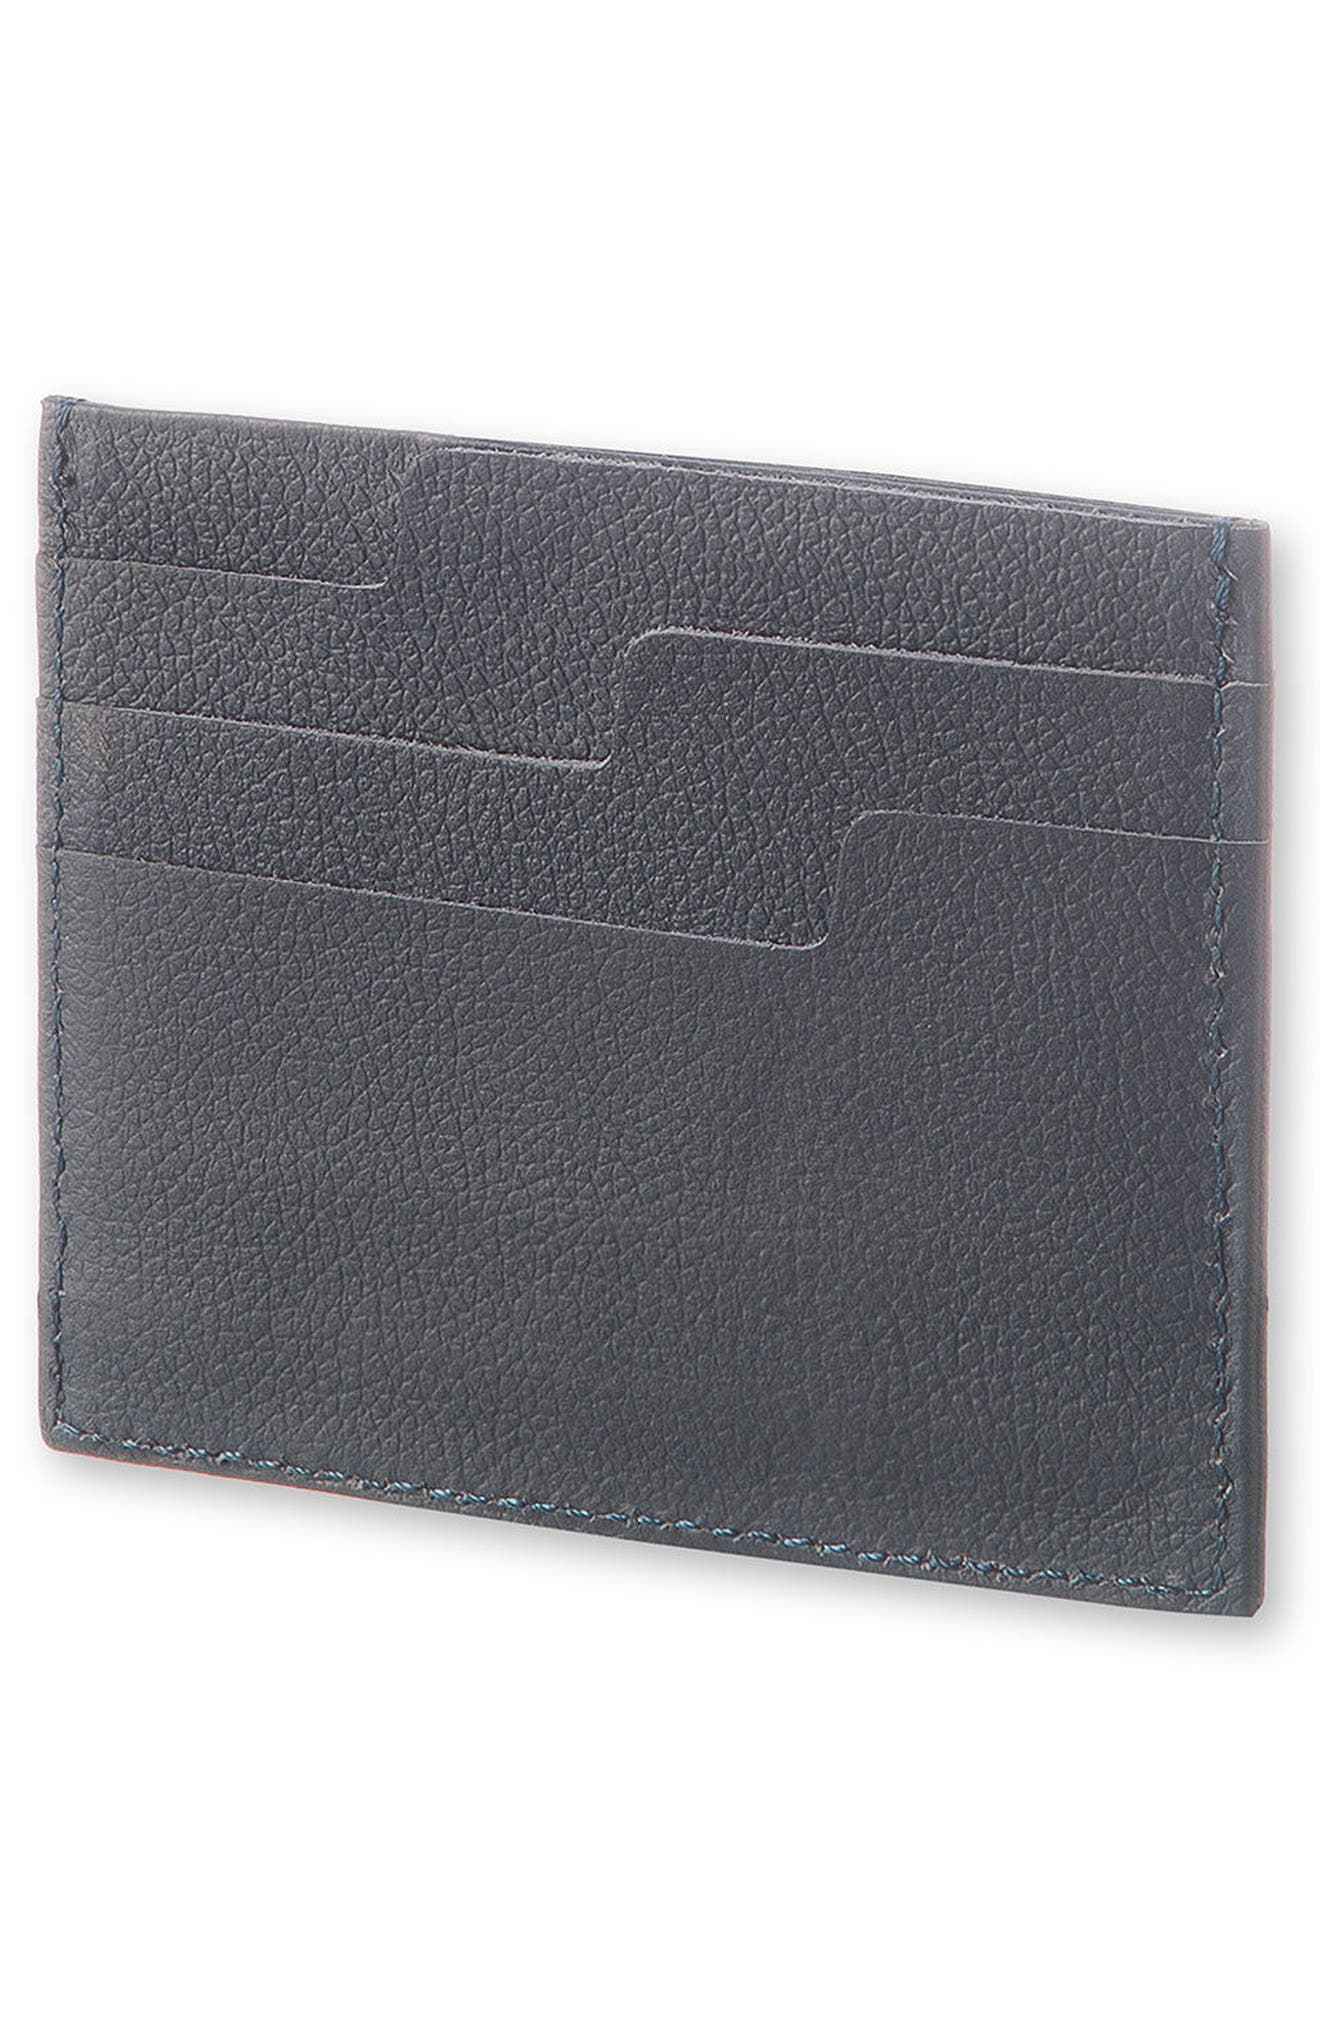 Moleskin Lineage Leather Card Case,                             Alternate thumbnail 3, color,                             AVIO BLUE